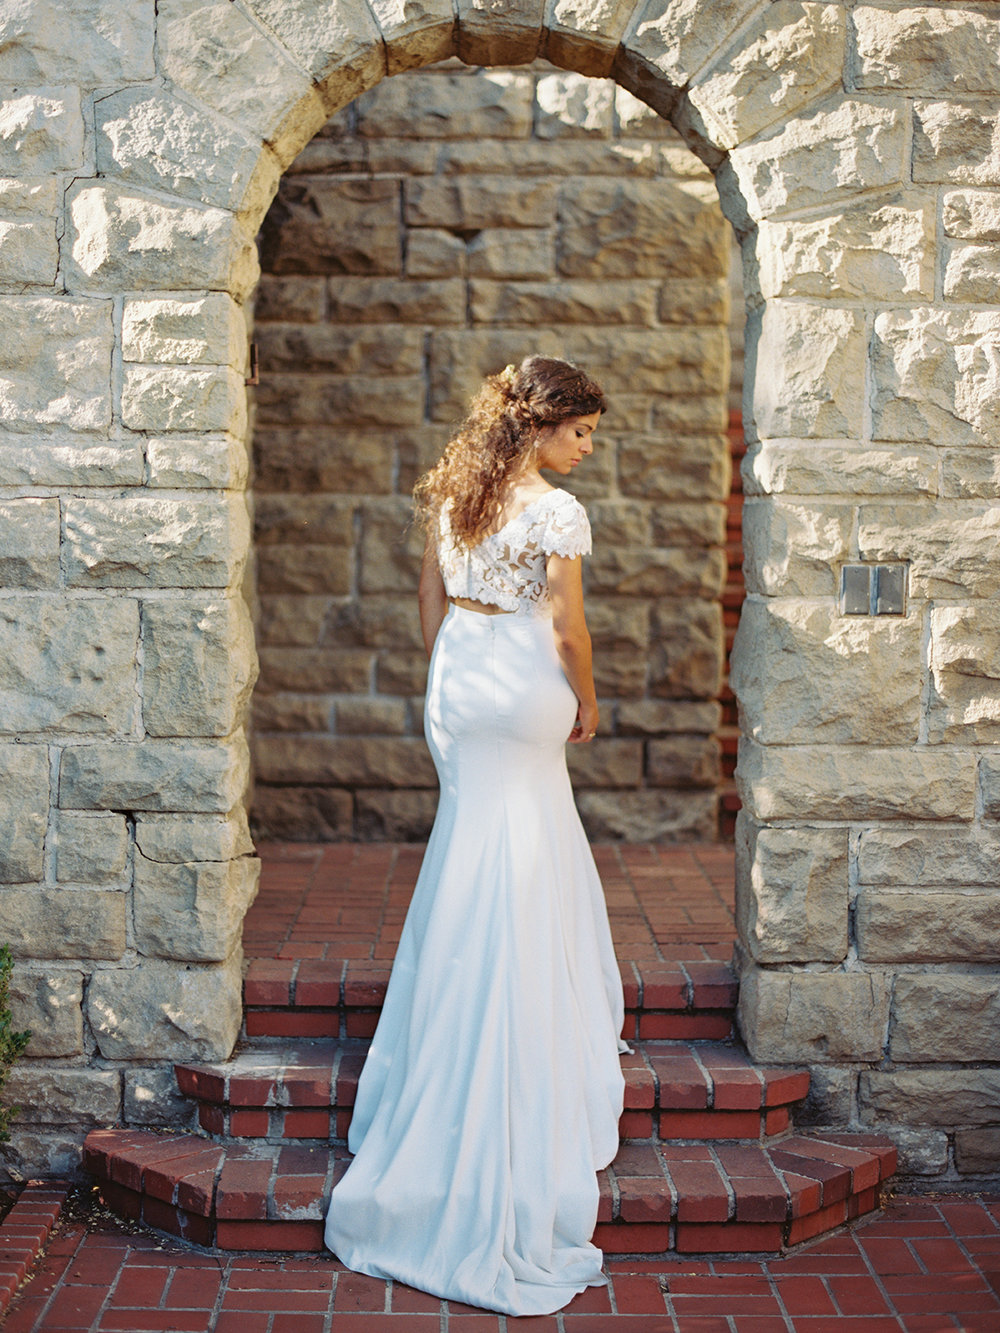 093-brian-sarra-los-angeles-wedding-brumley-wells-photography.jpg